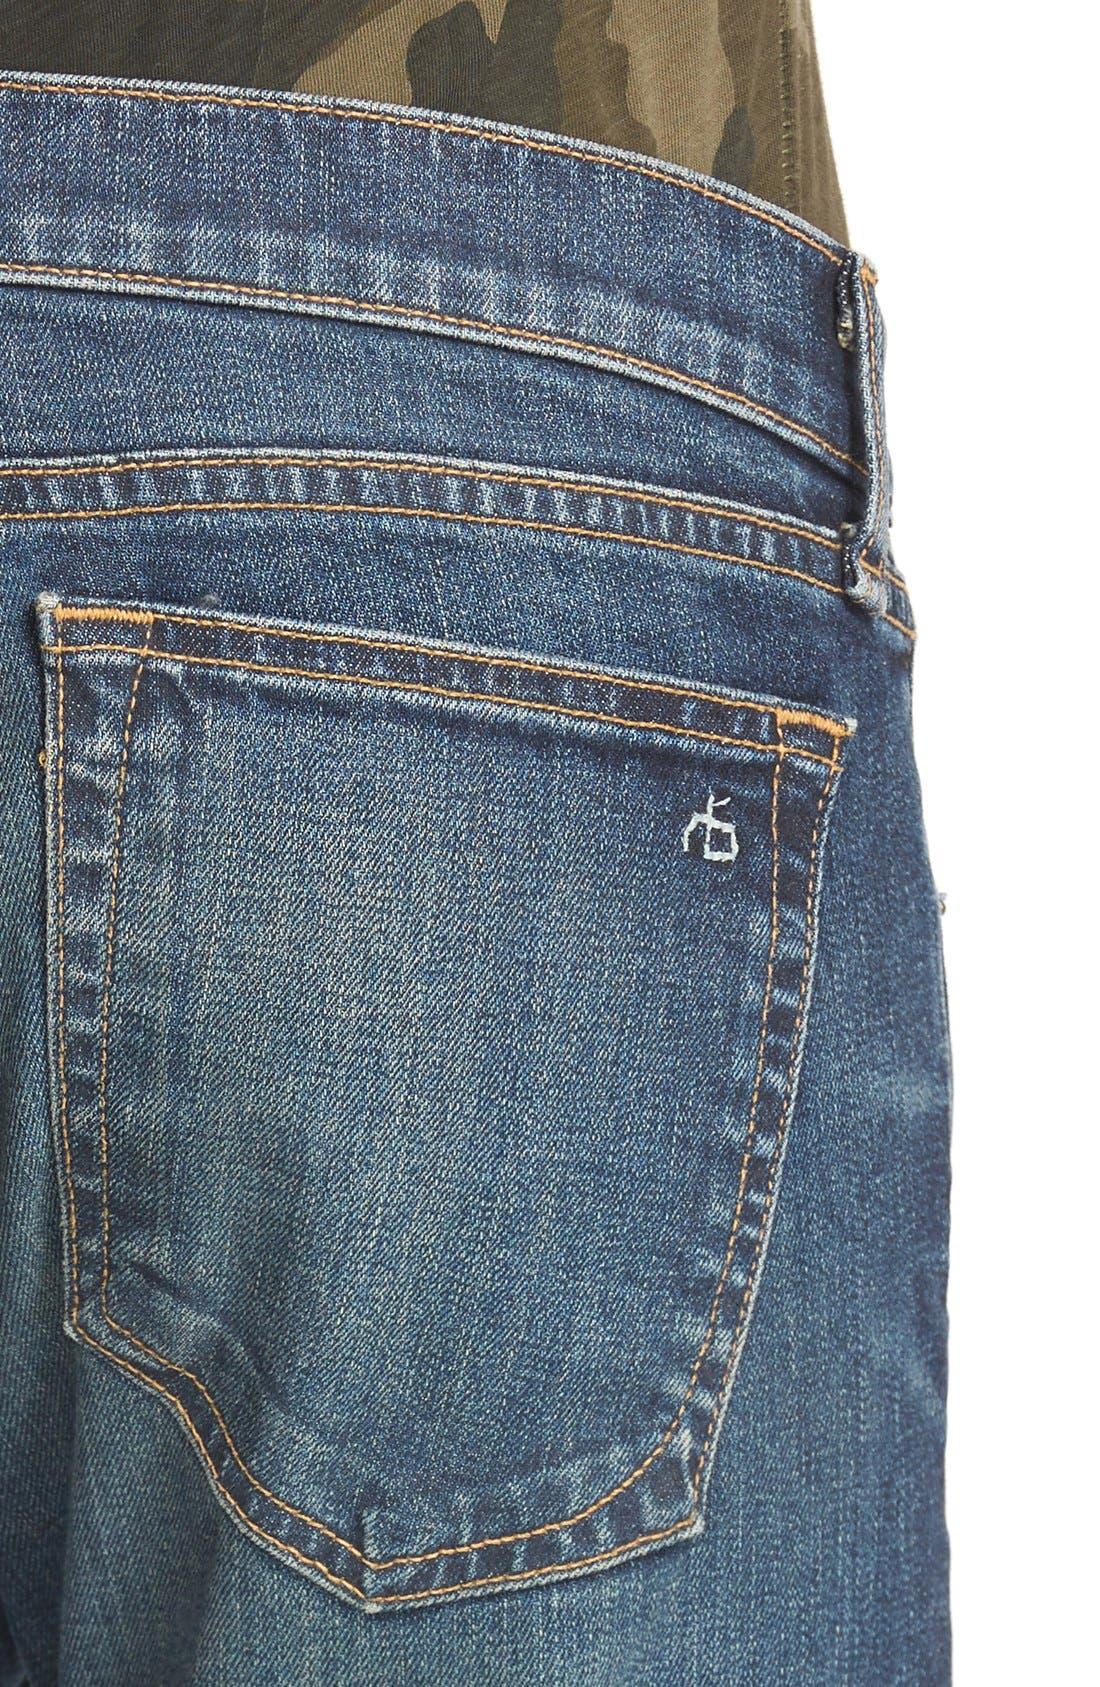 Alternate Image 4  - rag & bone/JEAN The Dre Slim Boyfriend Jeans (Mission)